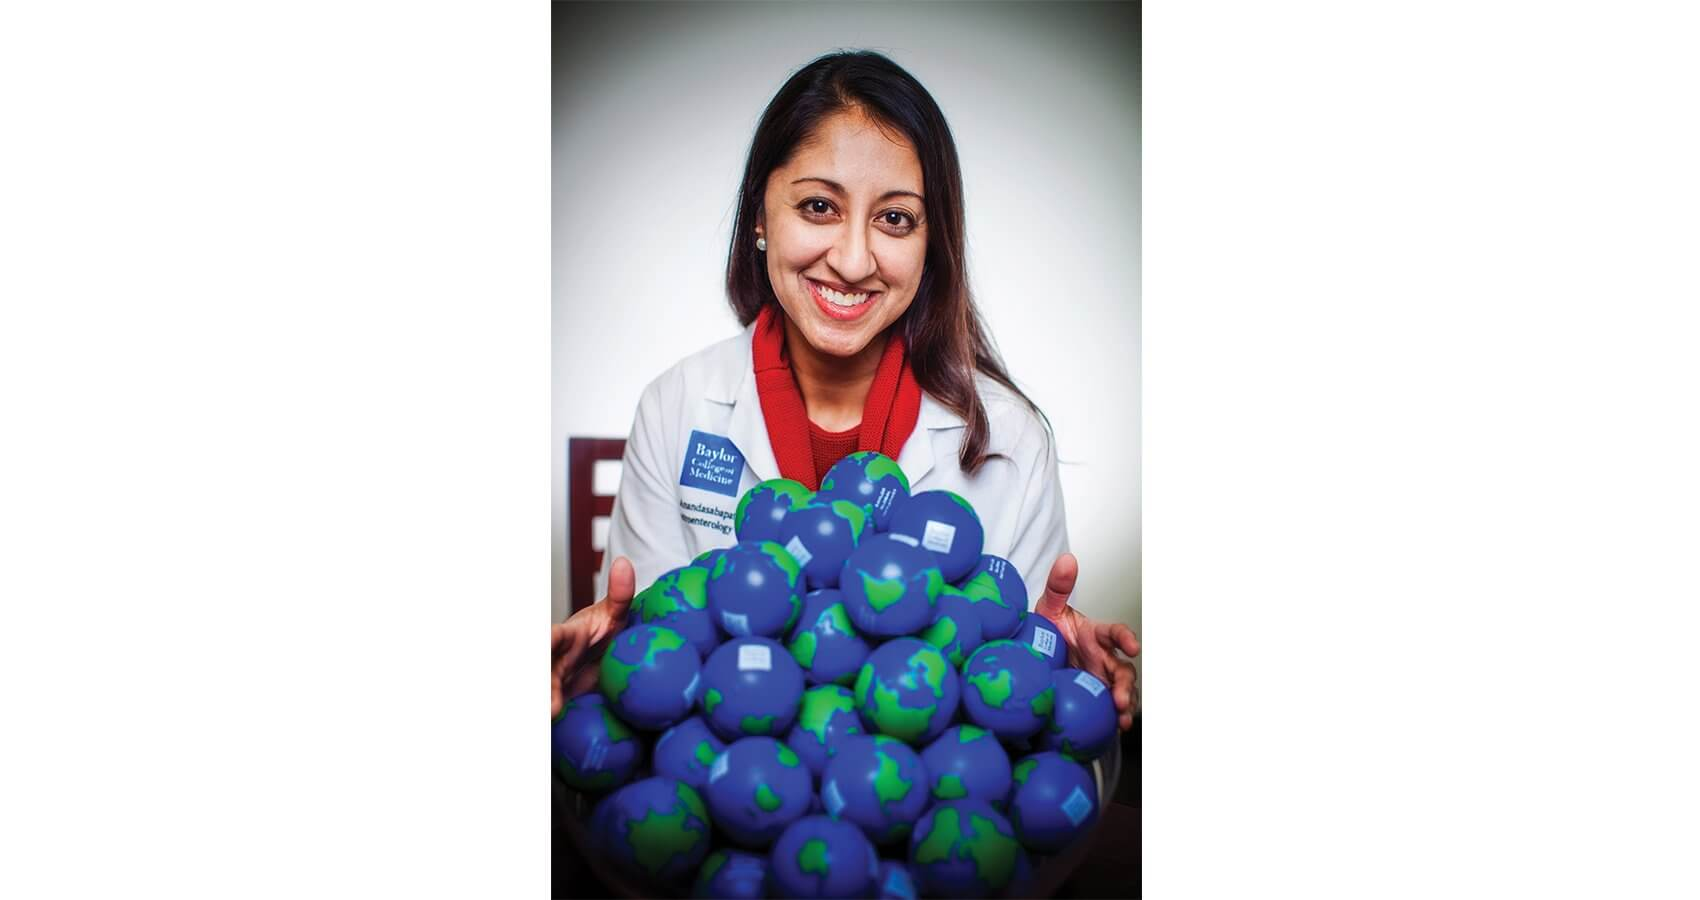 Sharmila Anandasabapathy, M.D. Professor and Director of Baylor Global Initiatives and Baylor Innovation Center